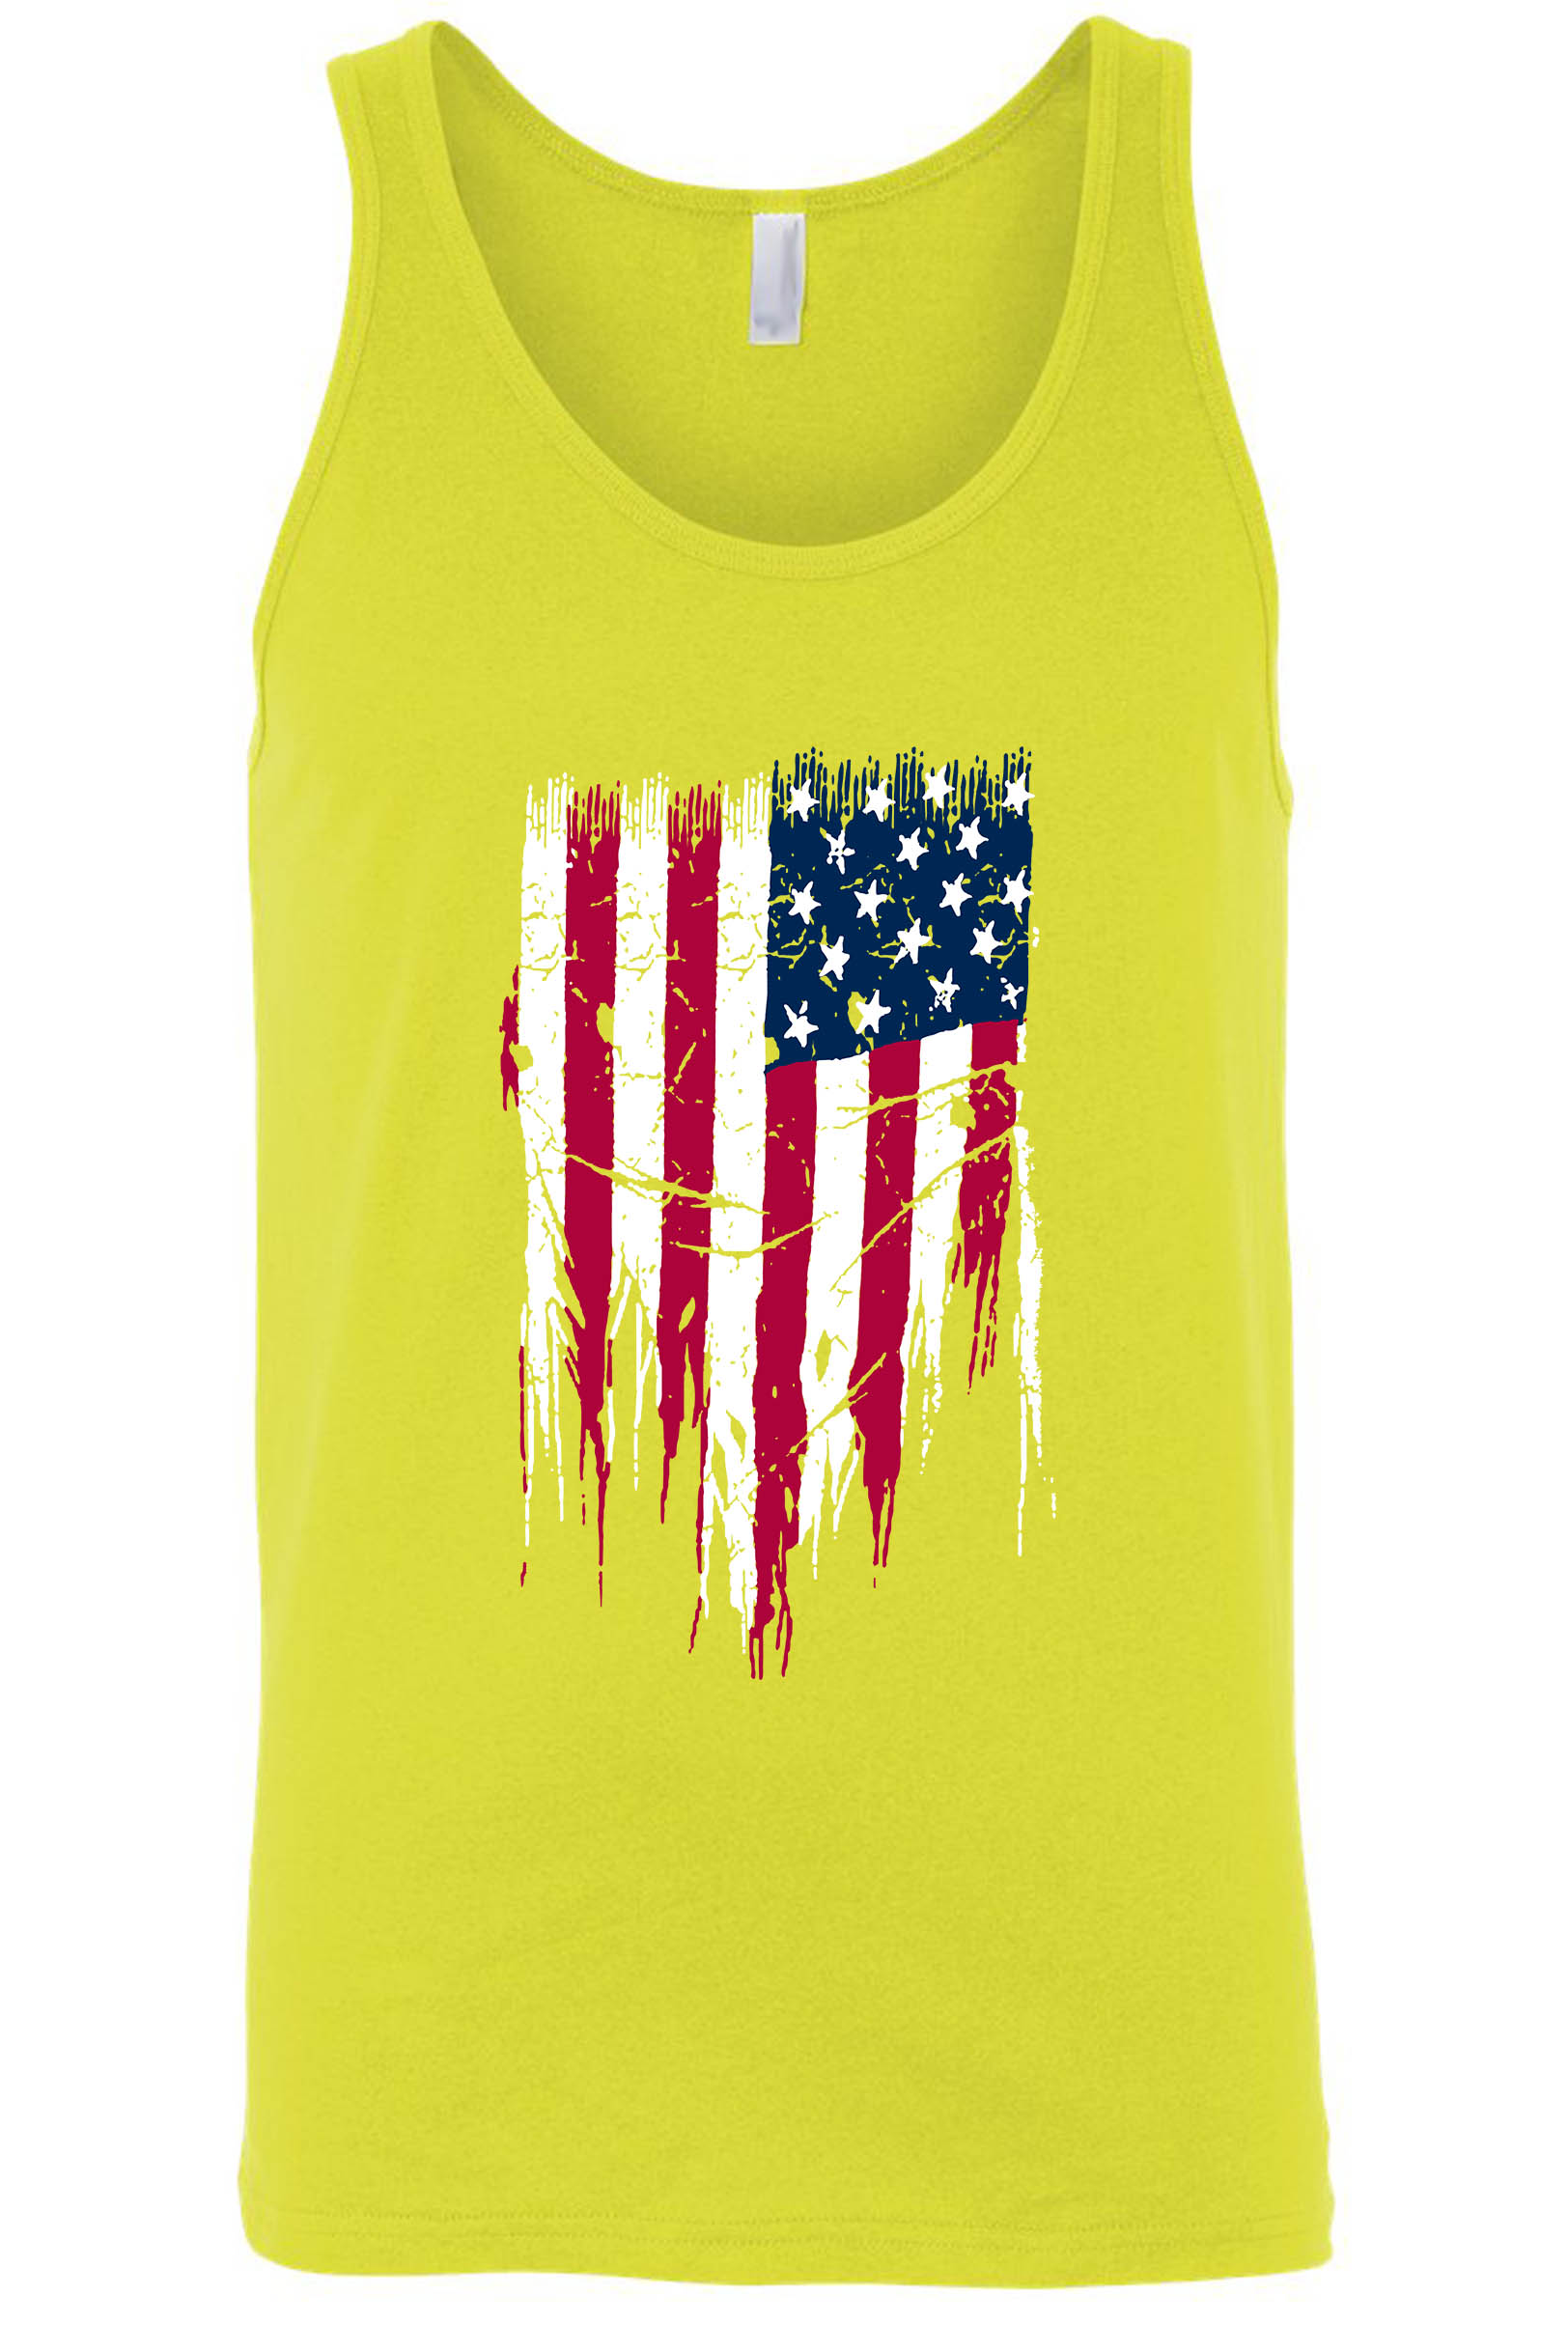 Men's/Unisex Ripped USA Flag Tank Top Shirt